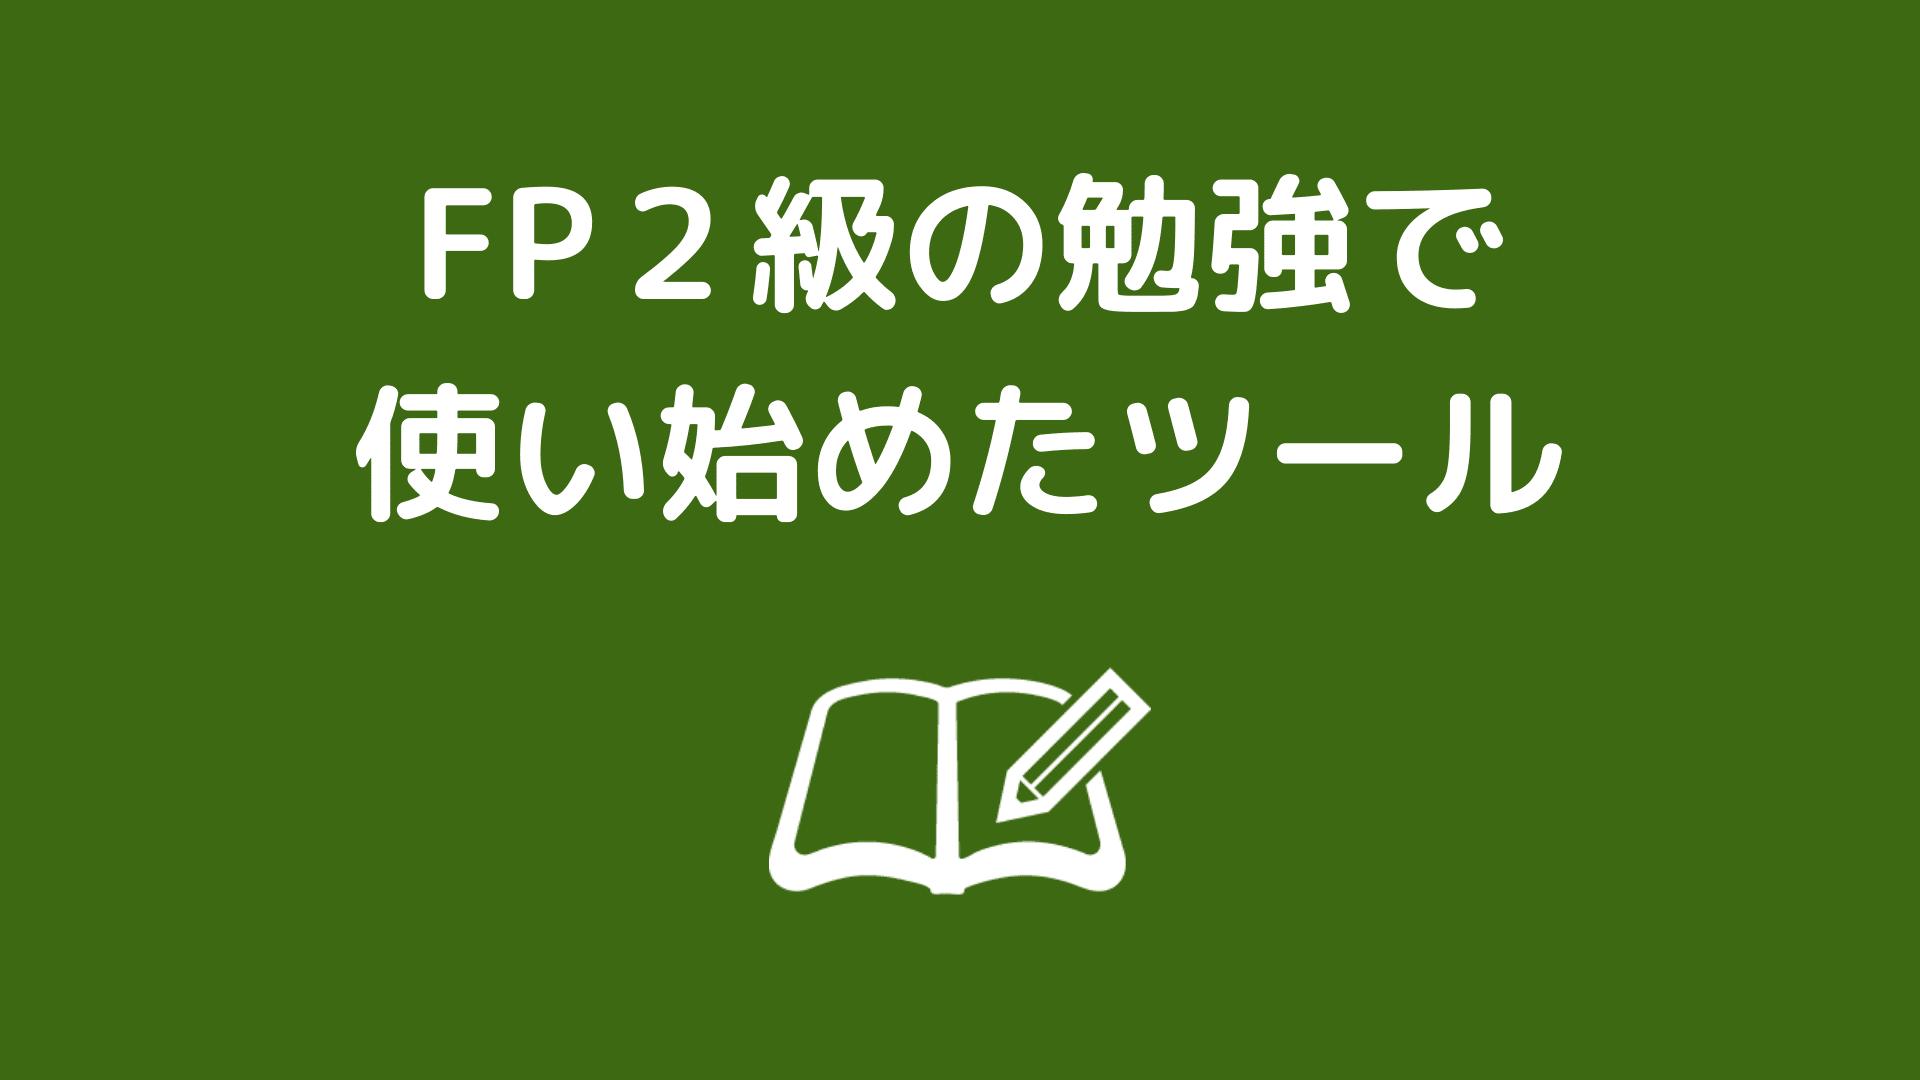 FP2級の勉強で使い始めたツール